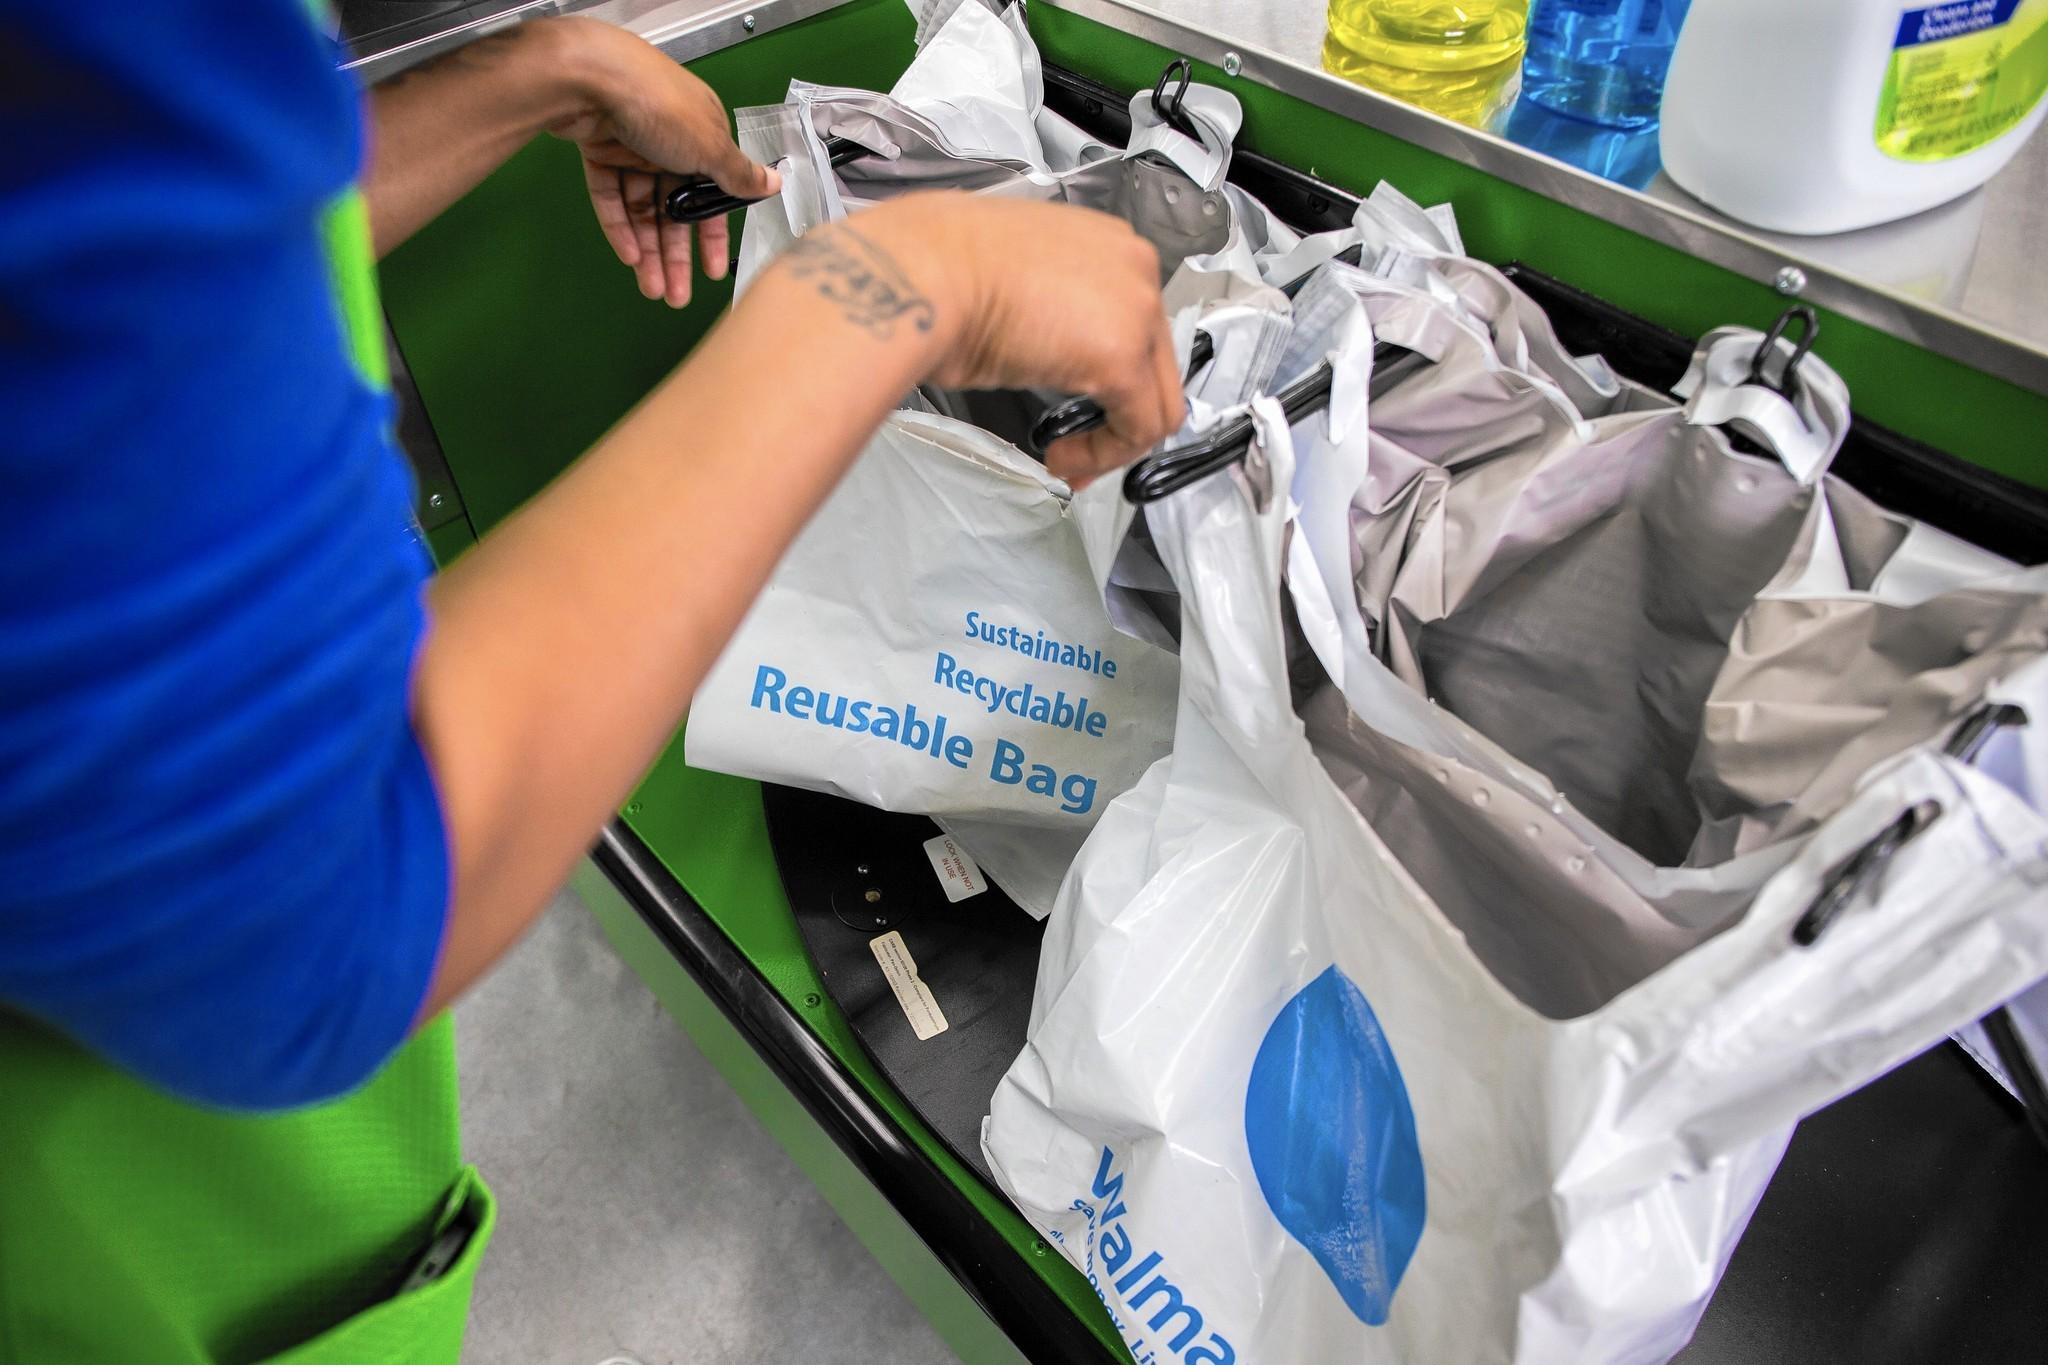 Plastic bag ban chicago - Plastic Bag Ban Chicago 27